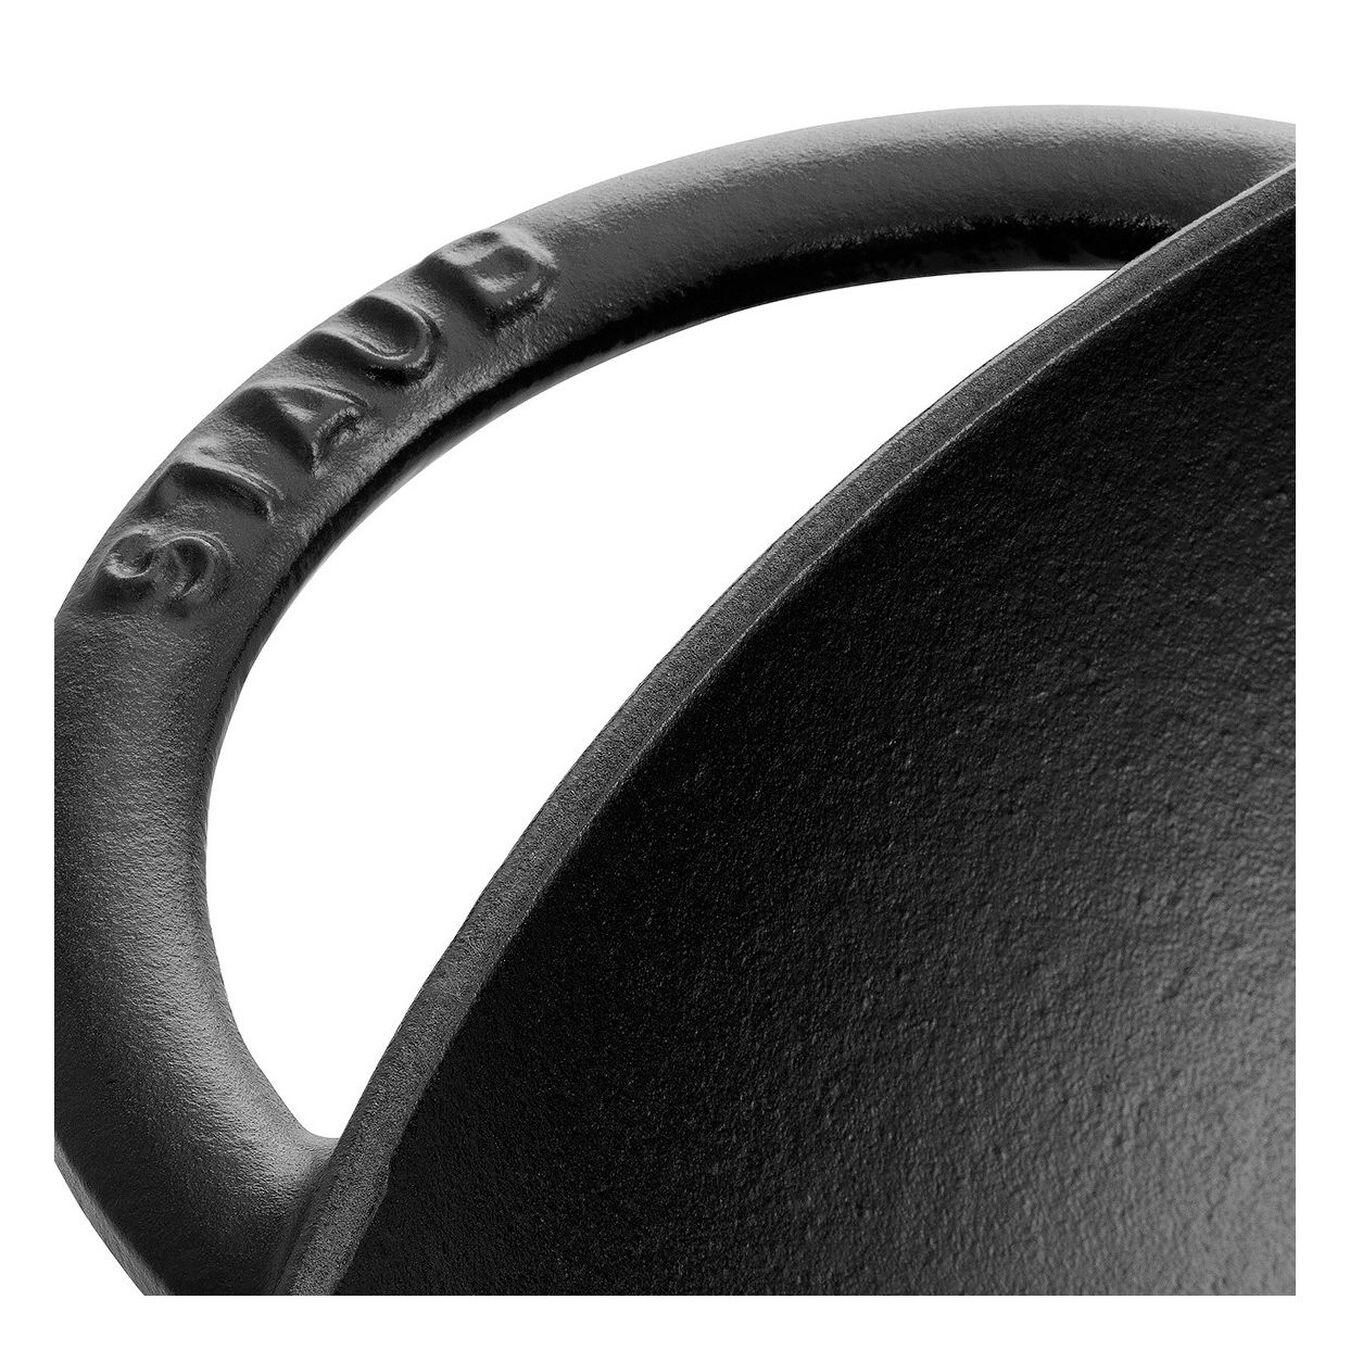 Wok com tampa de vidro 37 cm, Ferro fundido,,large 2